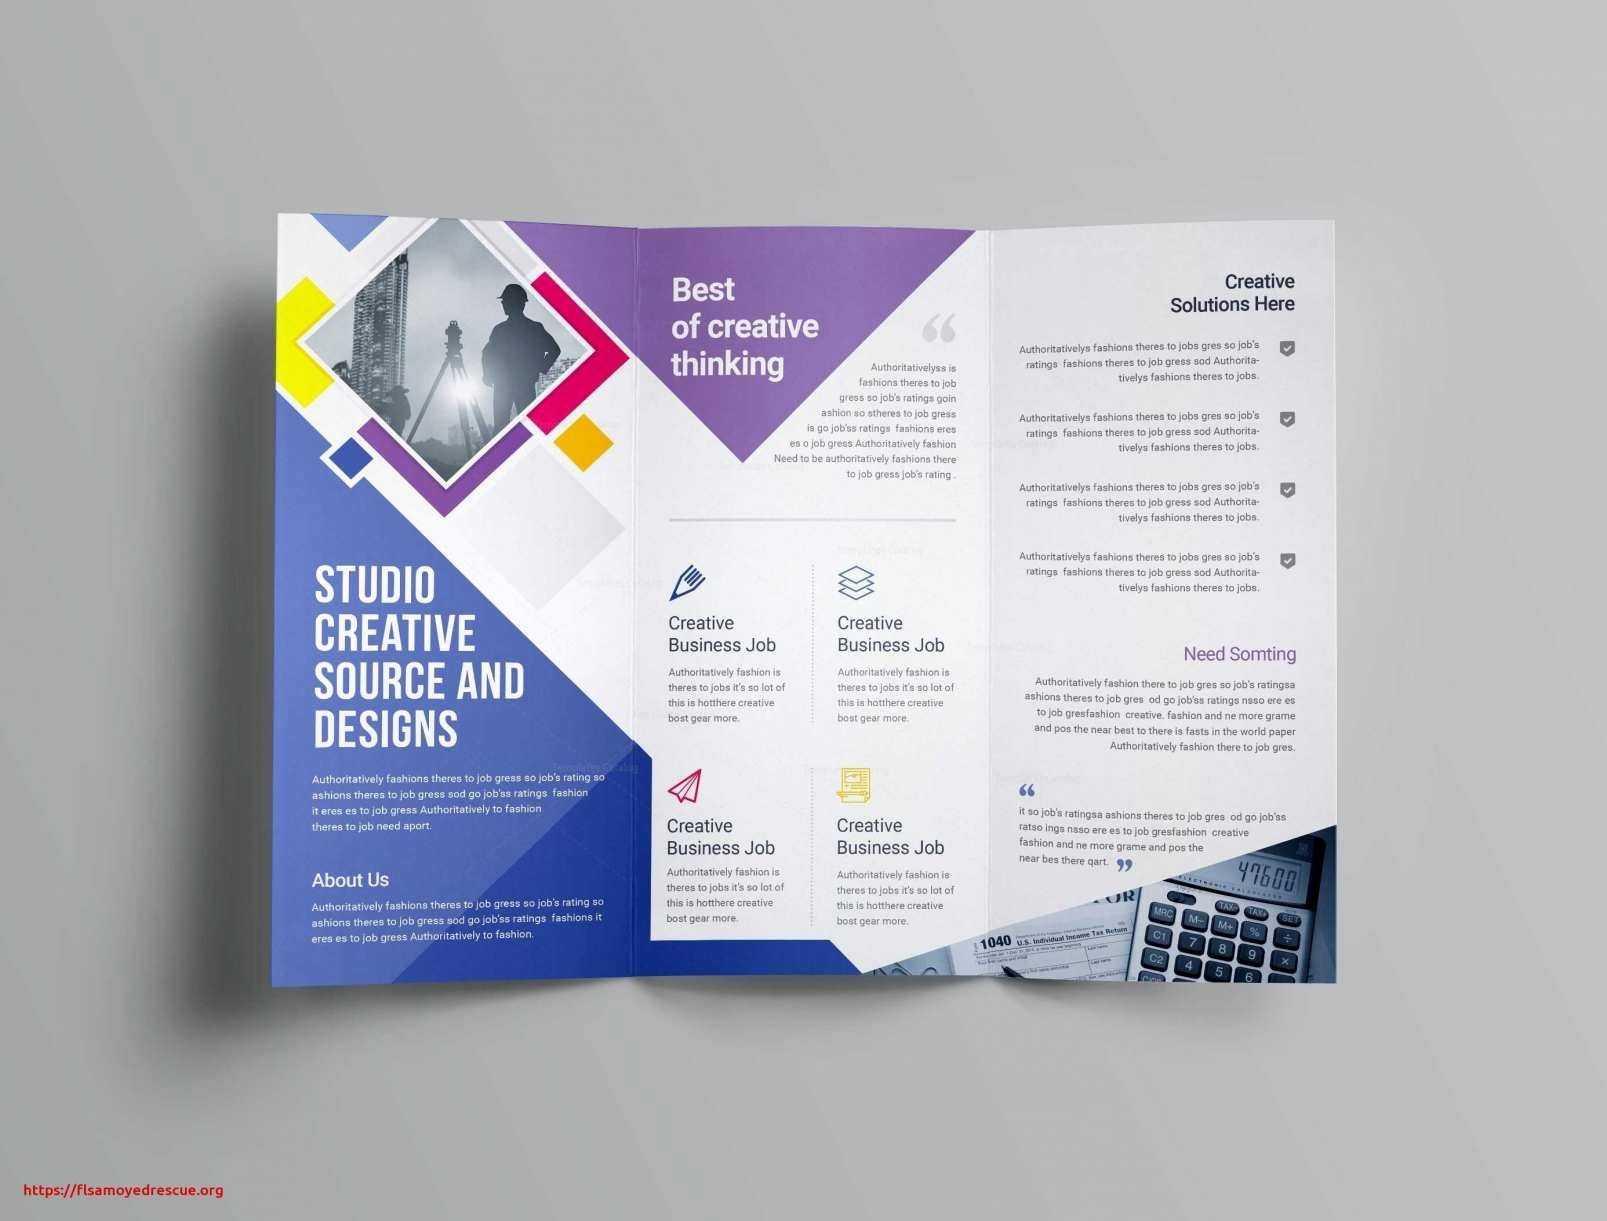 036 Healthcare Brochure Templates Free Download New For Word Within Healthcare Brochure Templates Free Download